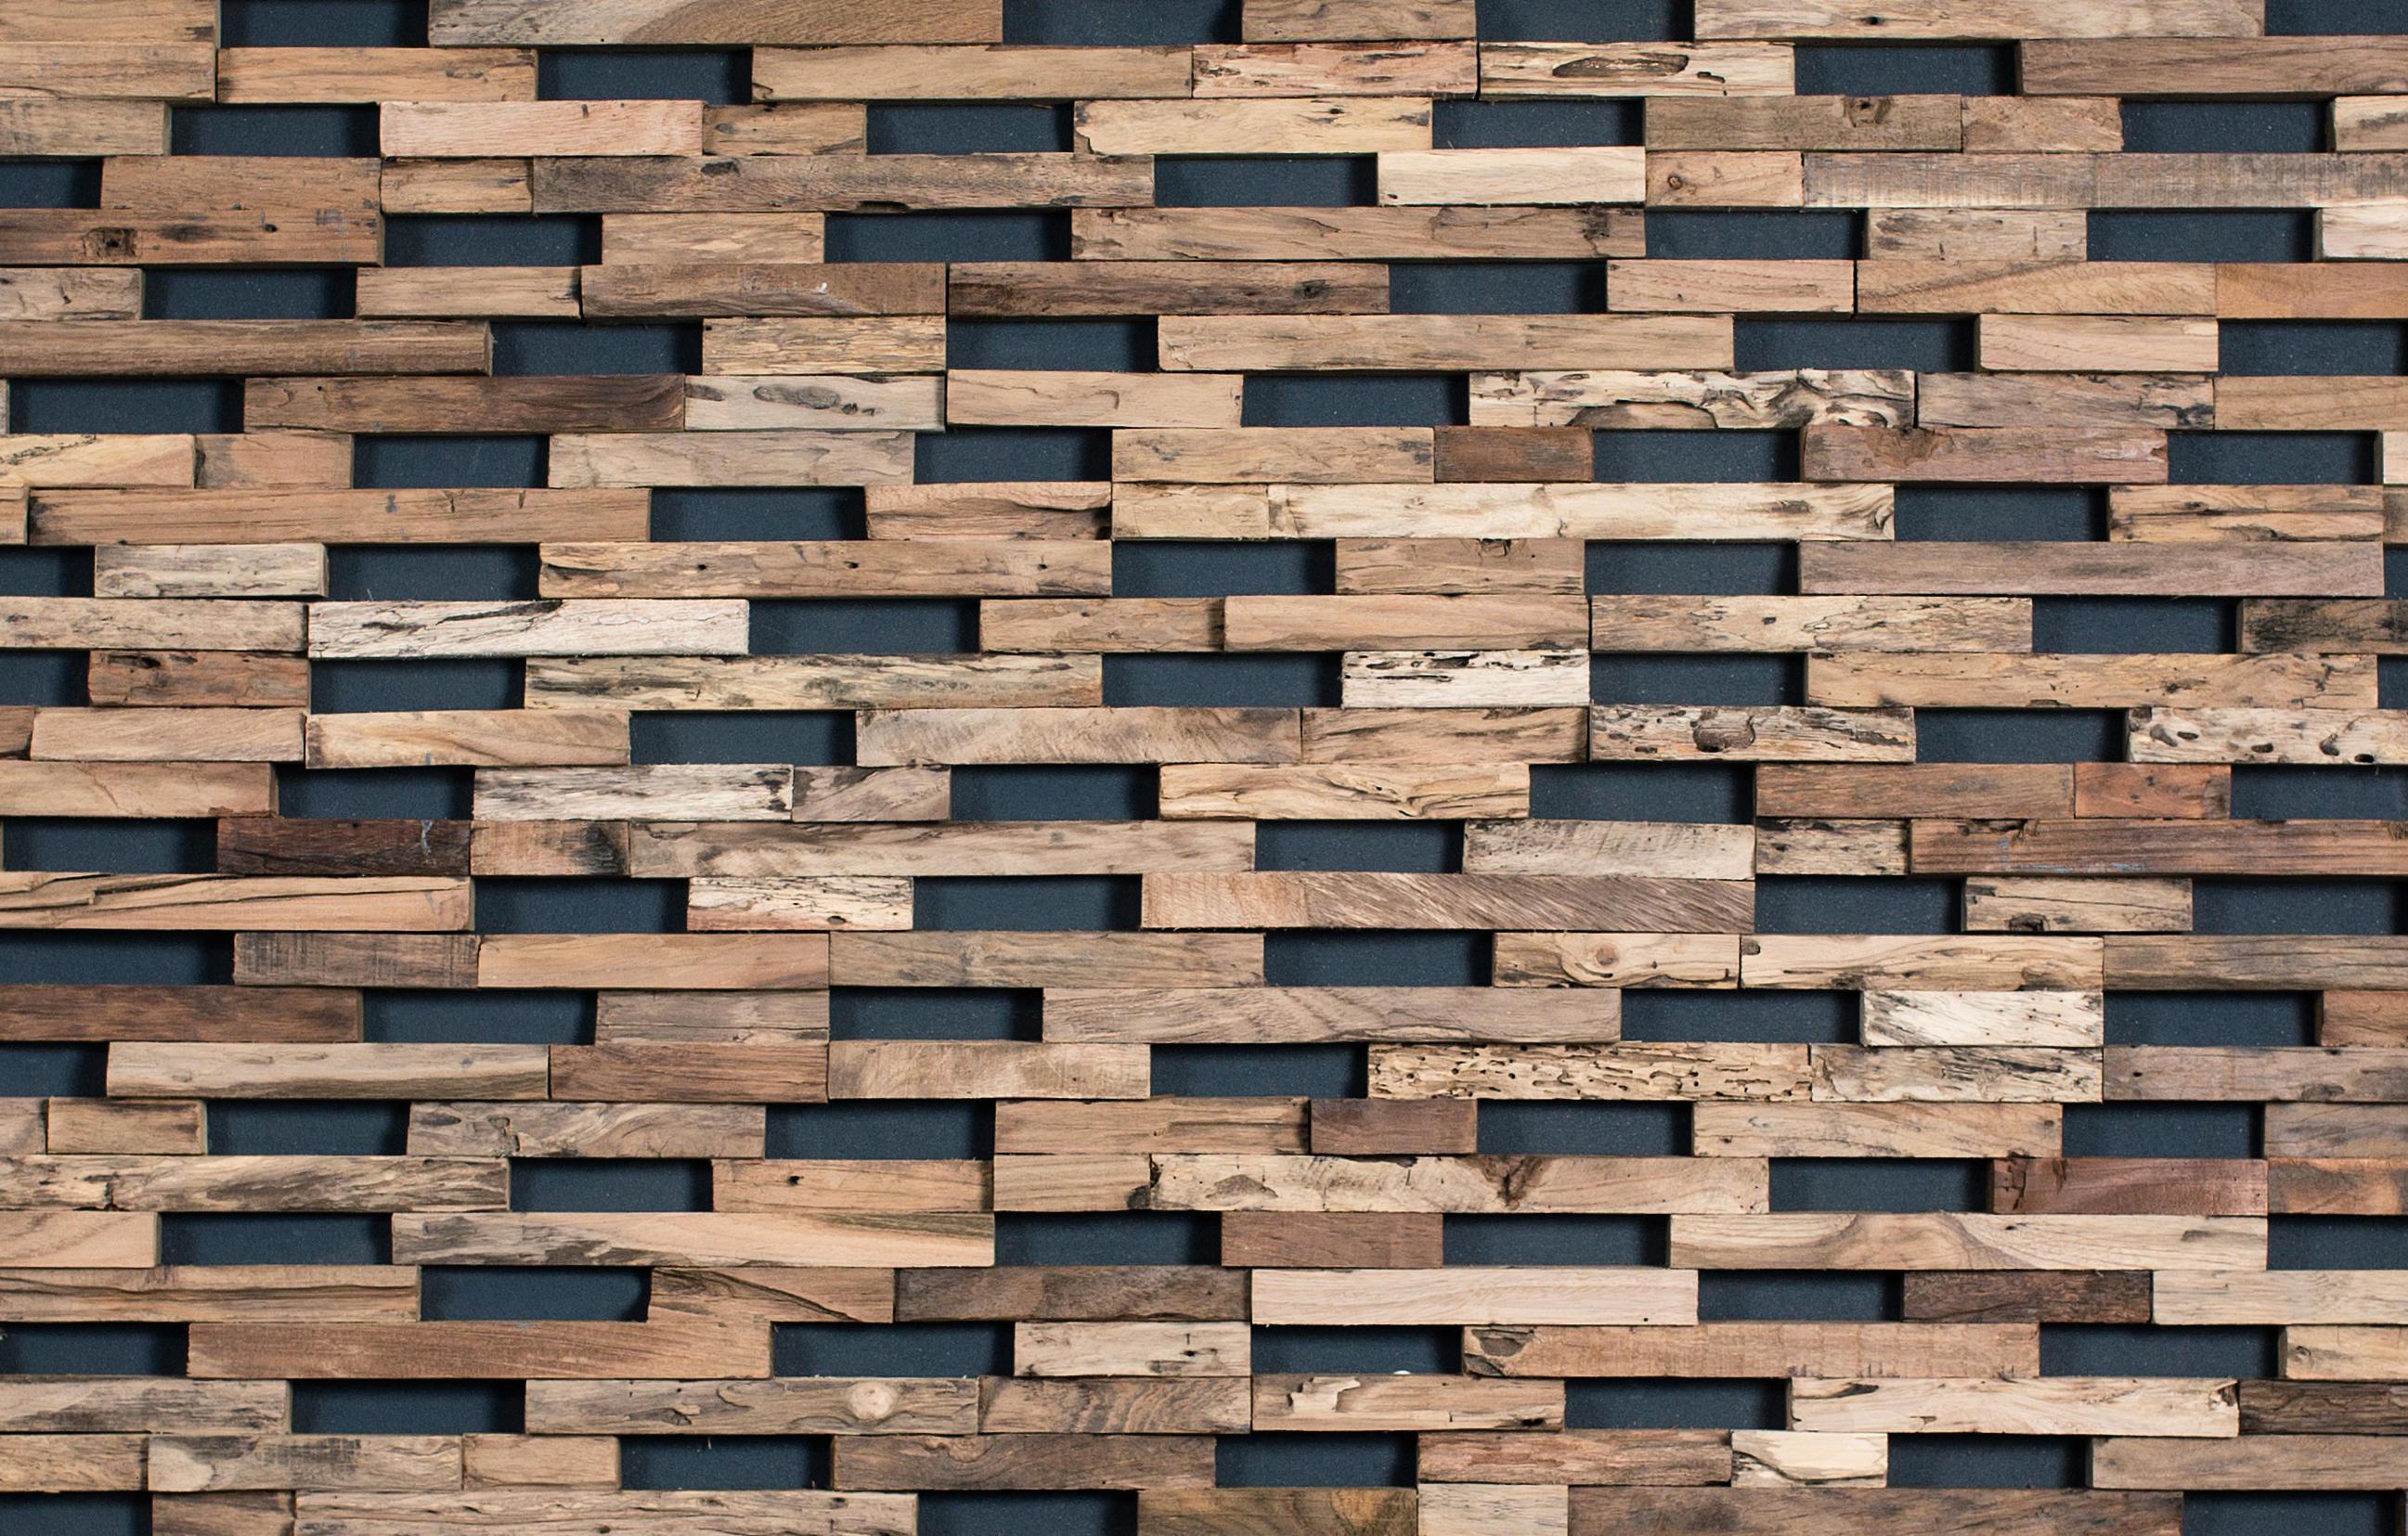 Train Wood Panels From Wonderwall Studios Architonic